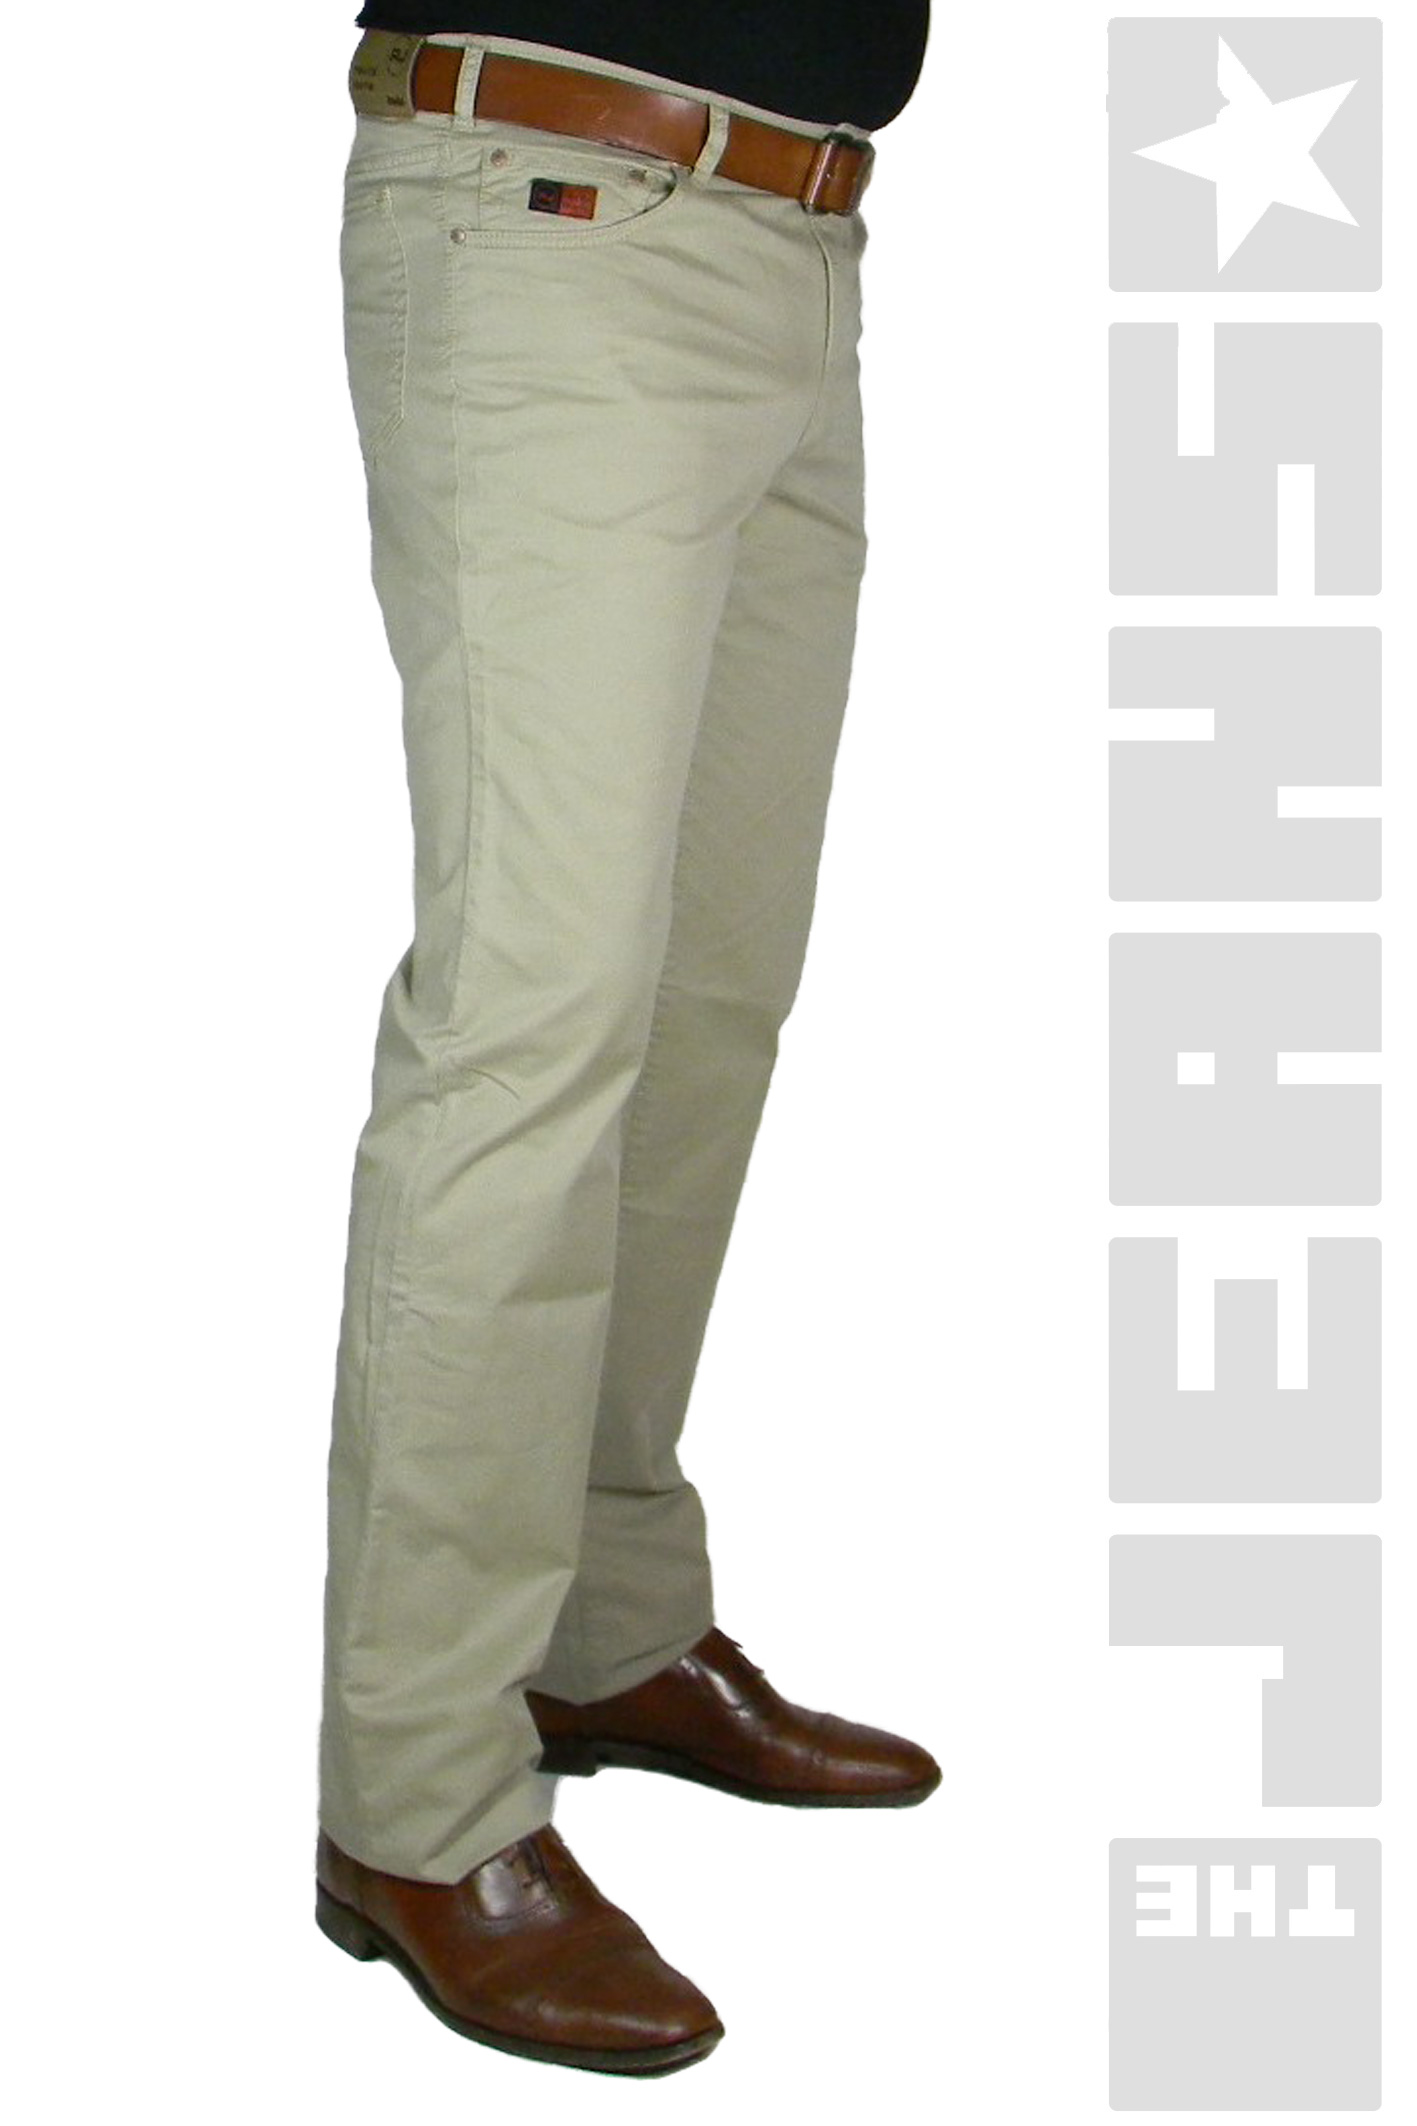 342 classic beige jeans herren the jeans. Black Bedroom Furniture Sets. Home Design Ideas